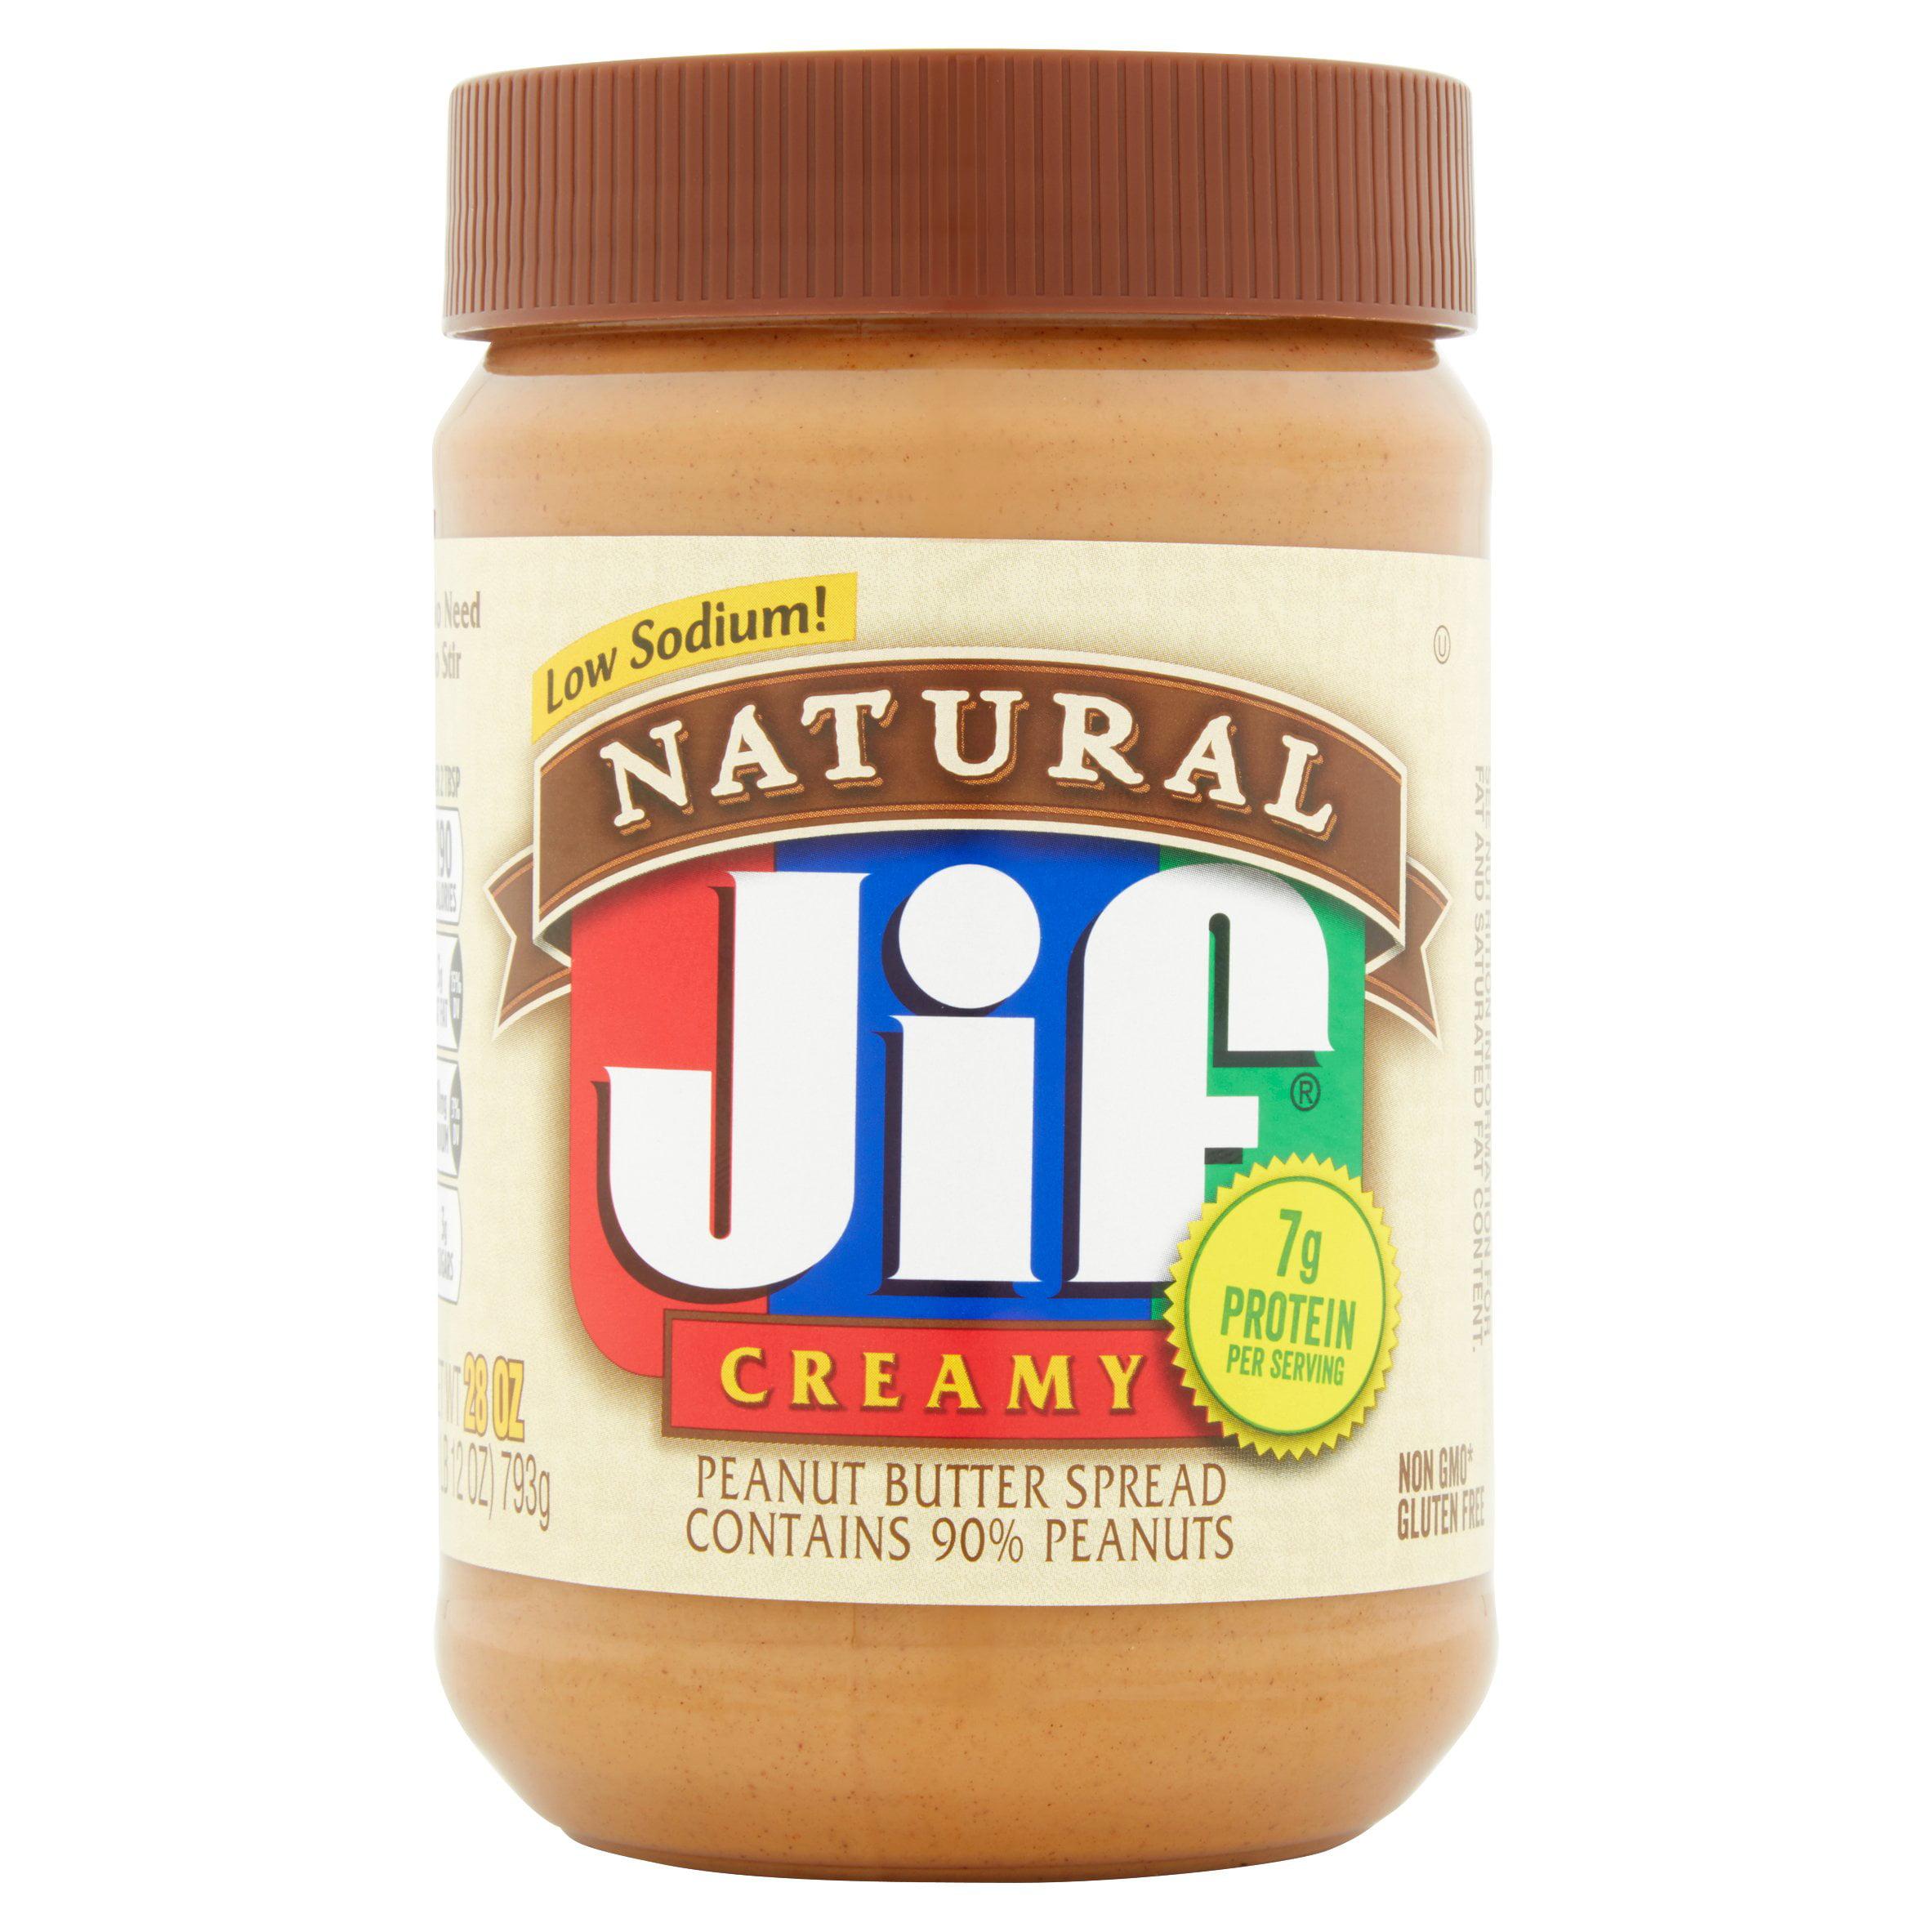 Jif Natural Creamy Peanut Butter, 28 oz